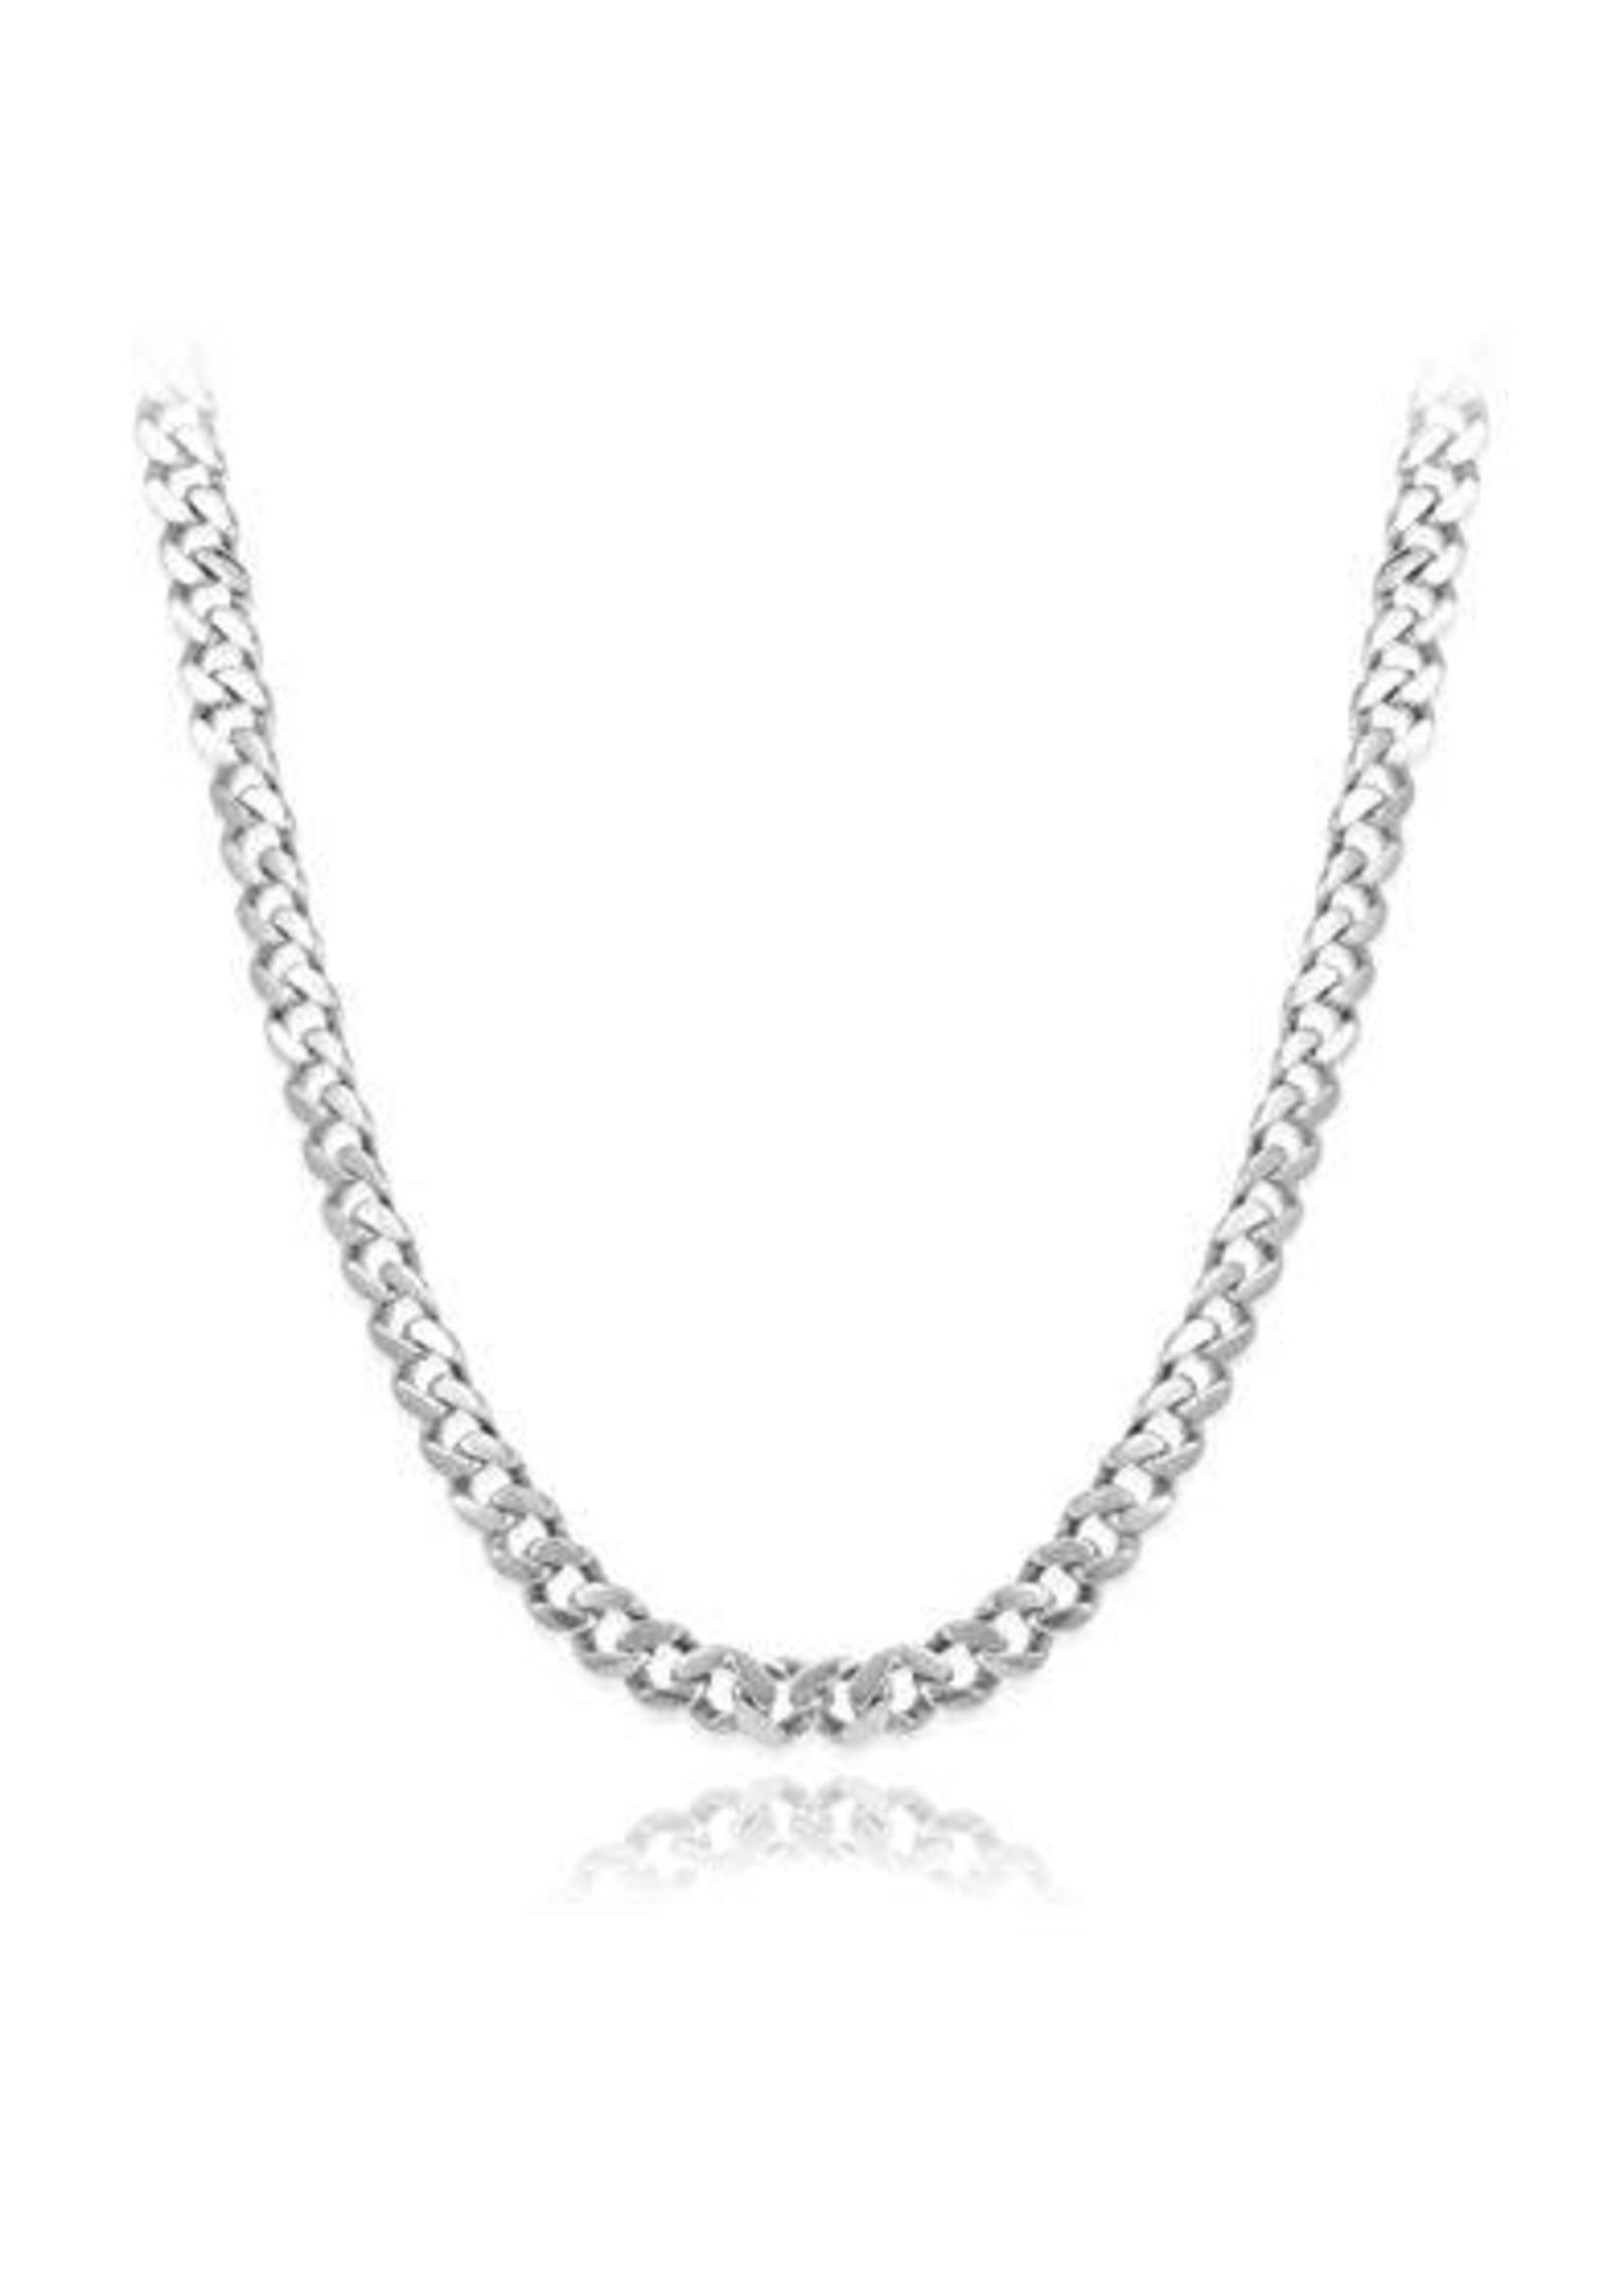 Jewellery 10K WHITE GOLD CHAIN 12G